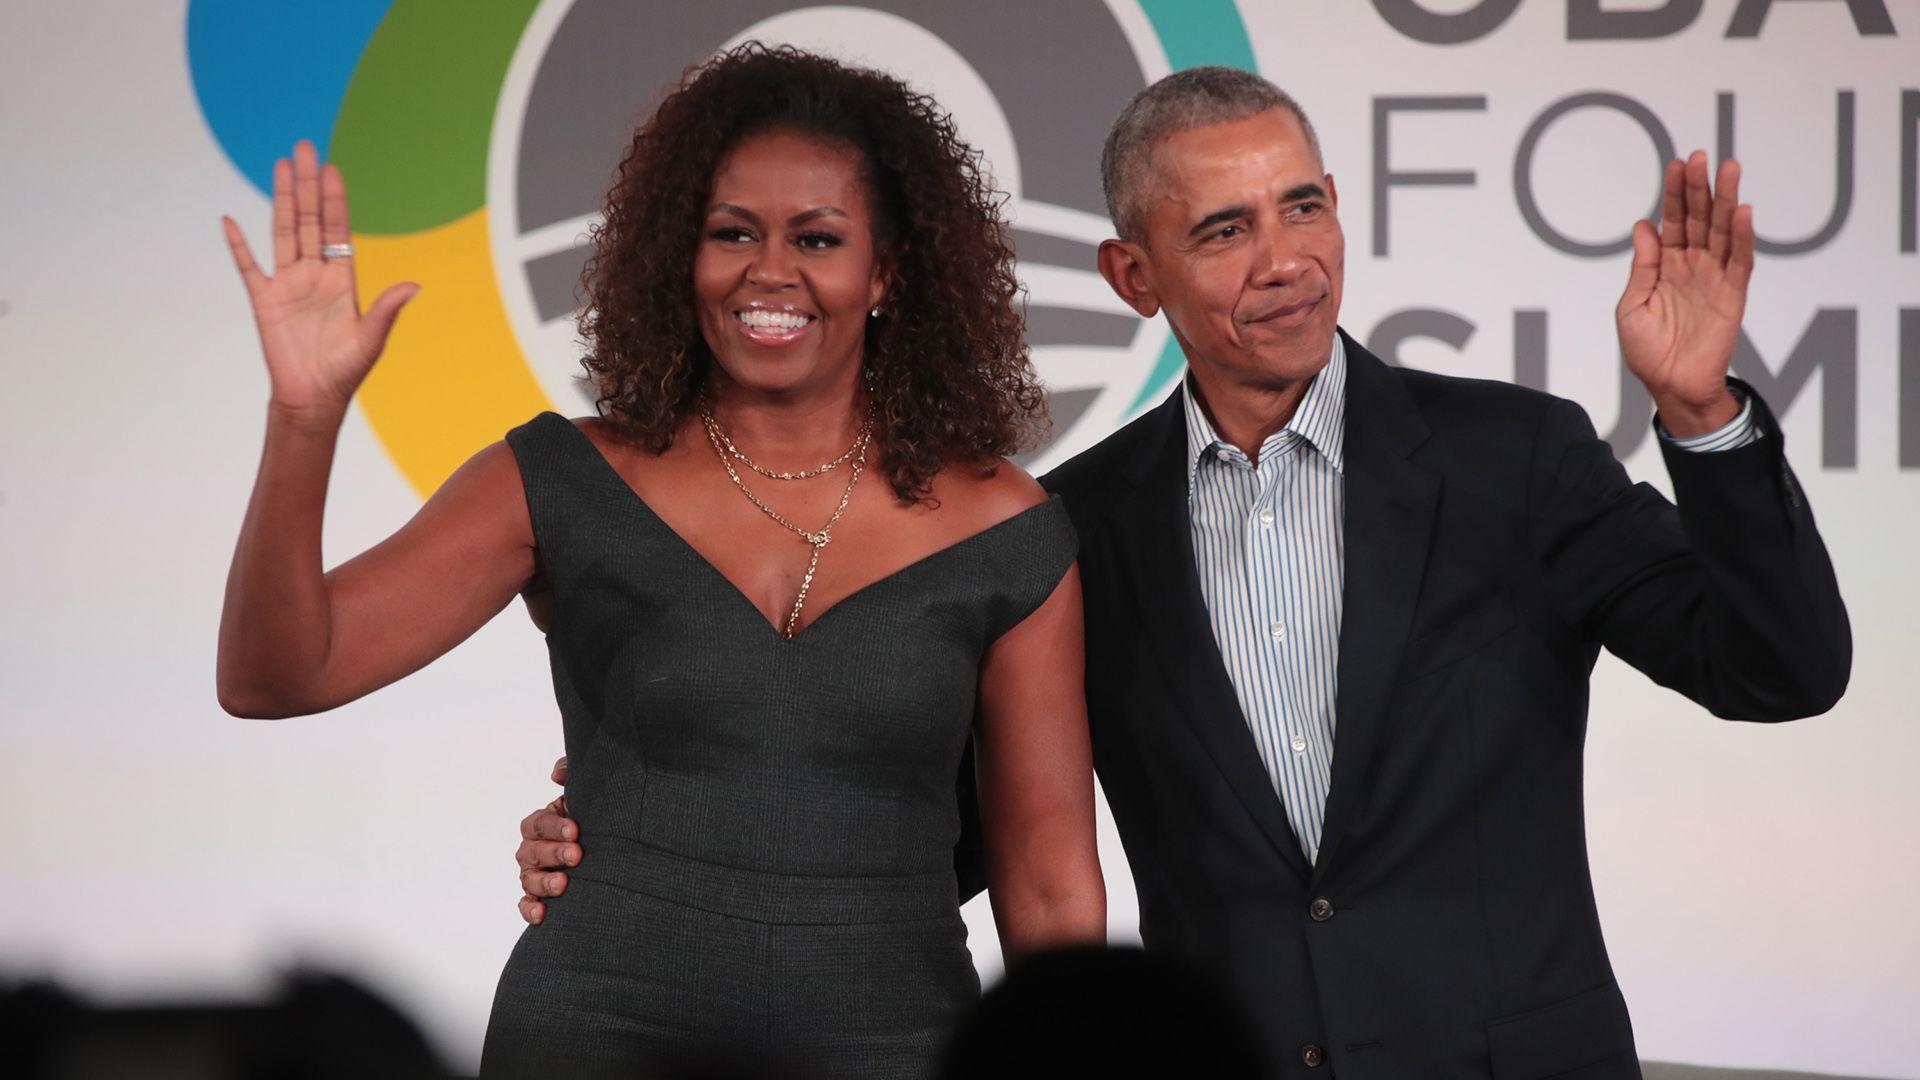 Cuki fotóval köszöntötte férjét Michelle Obama